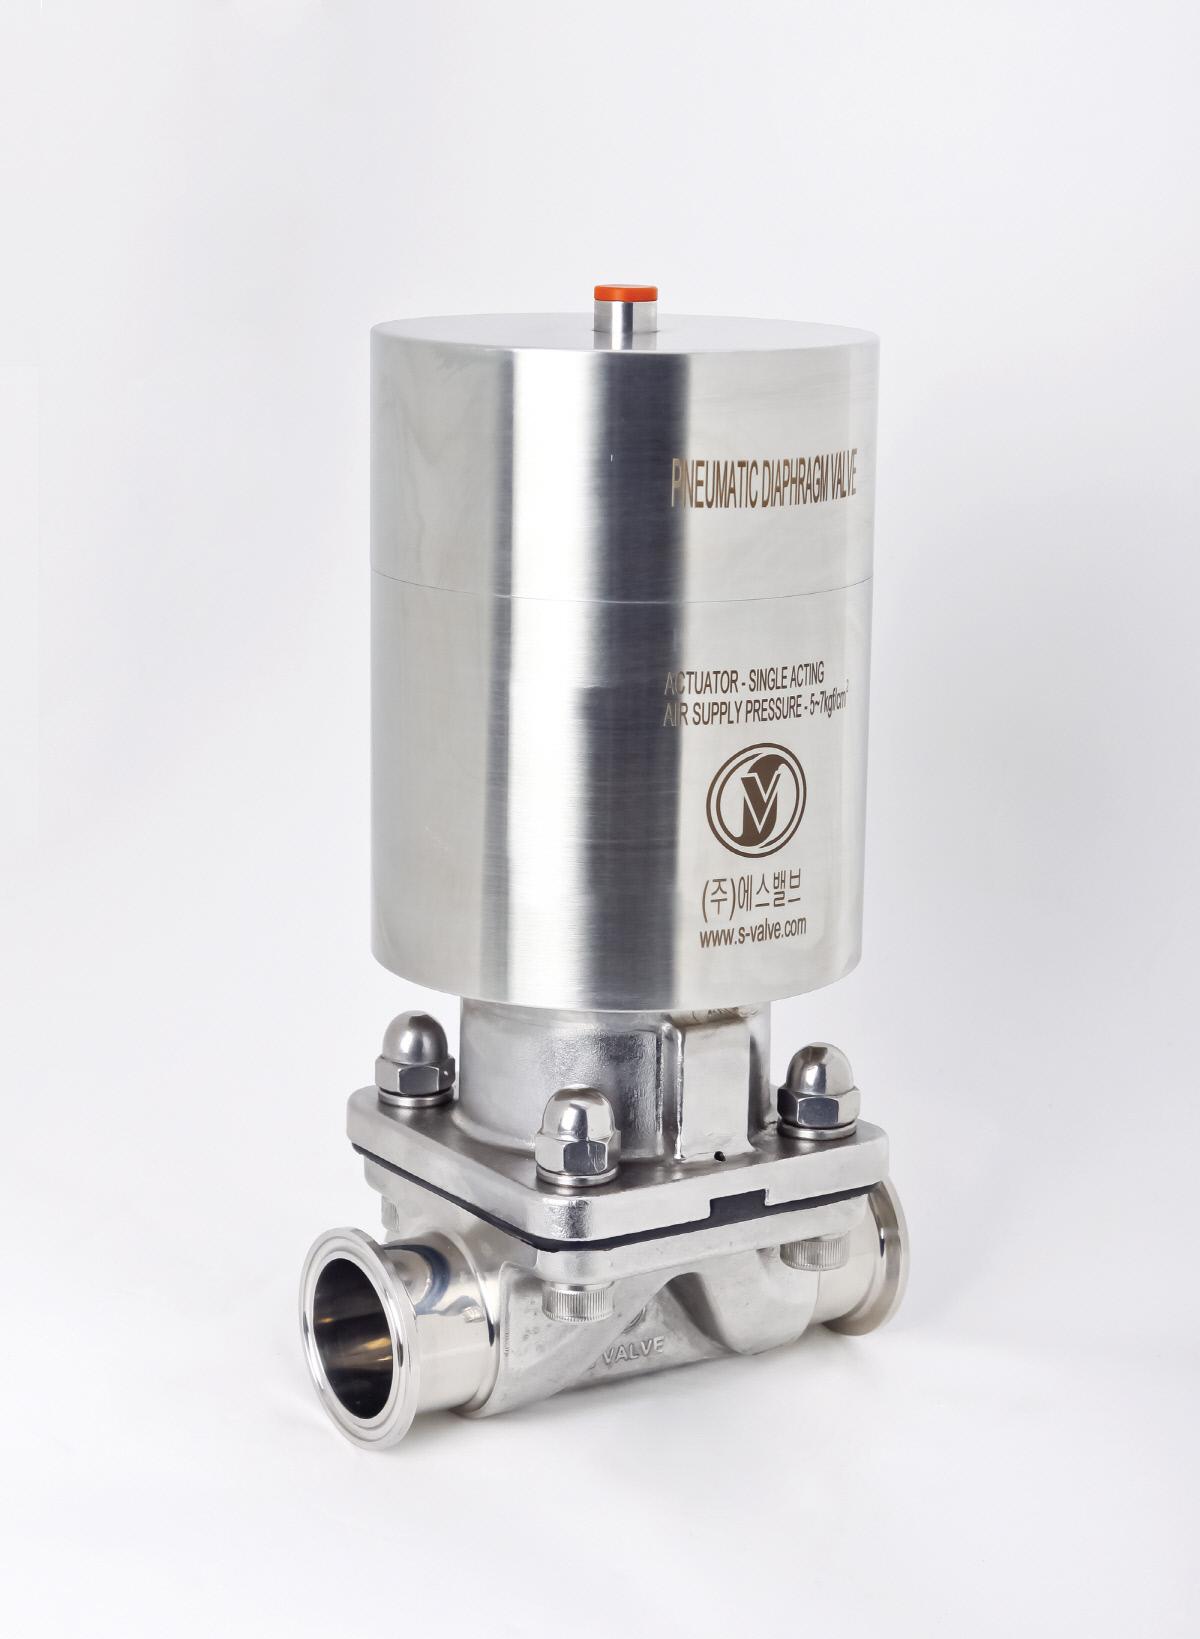 S-valve_0024.jpg